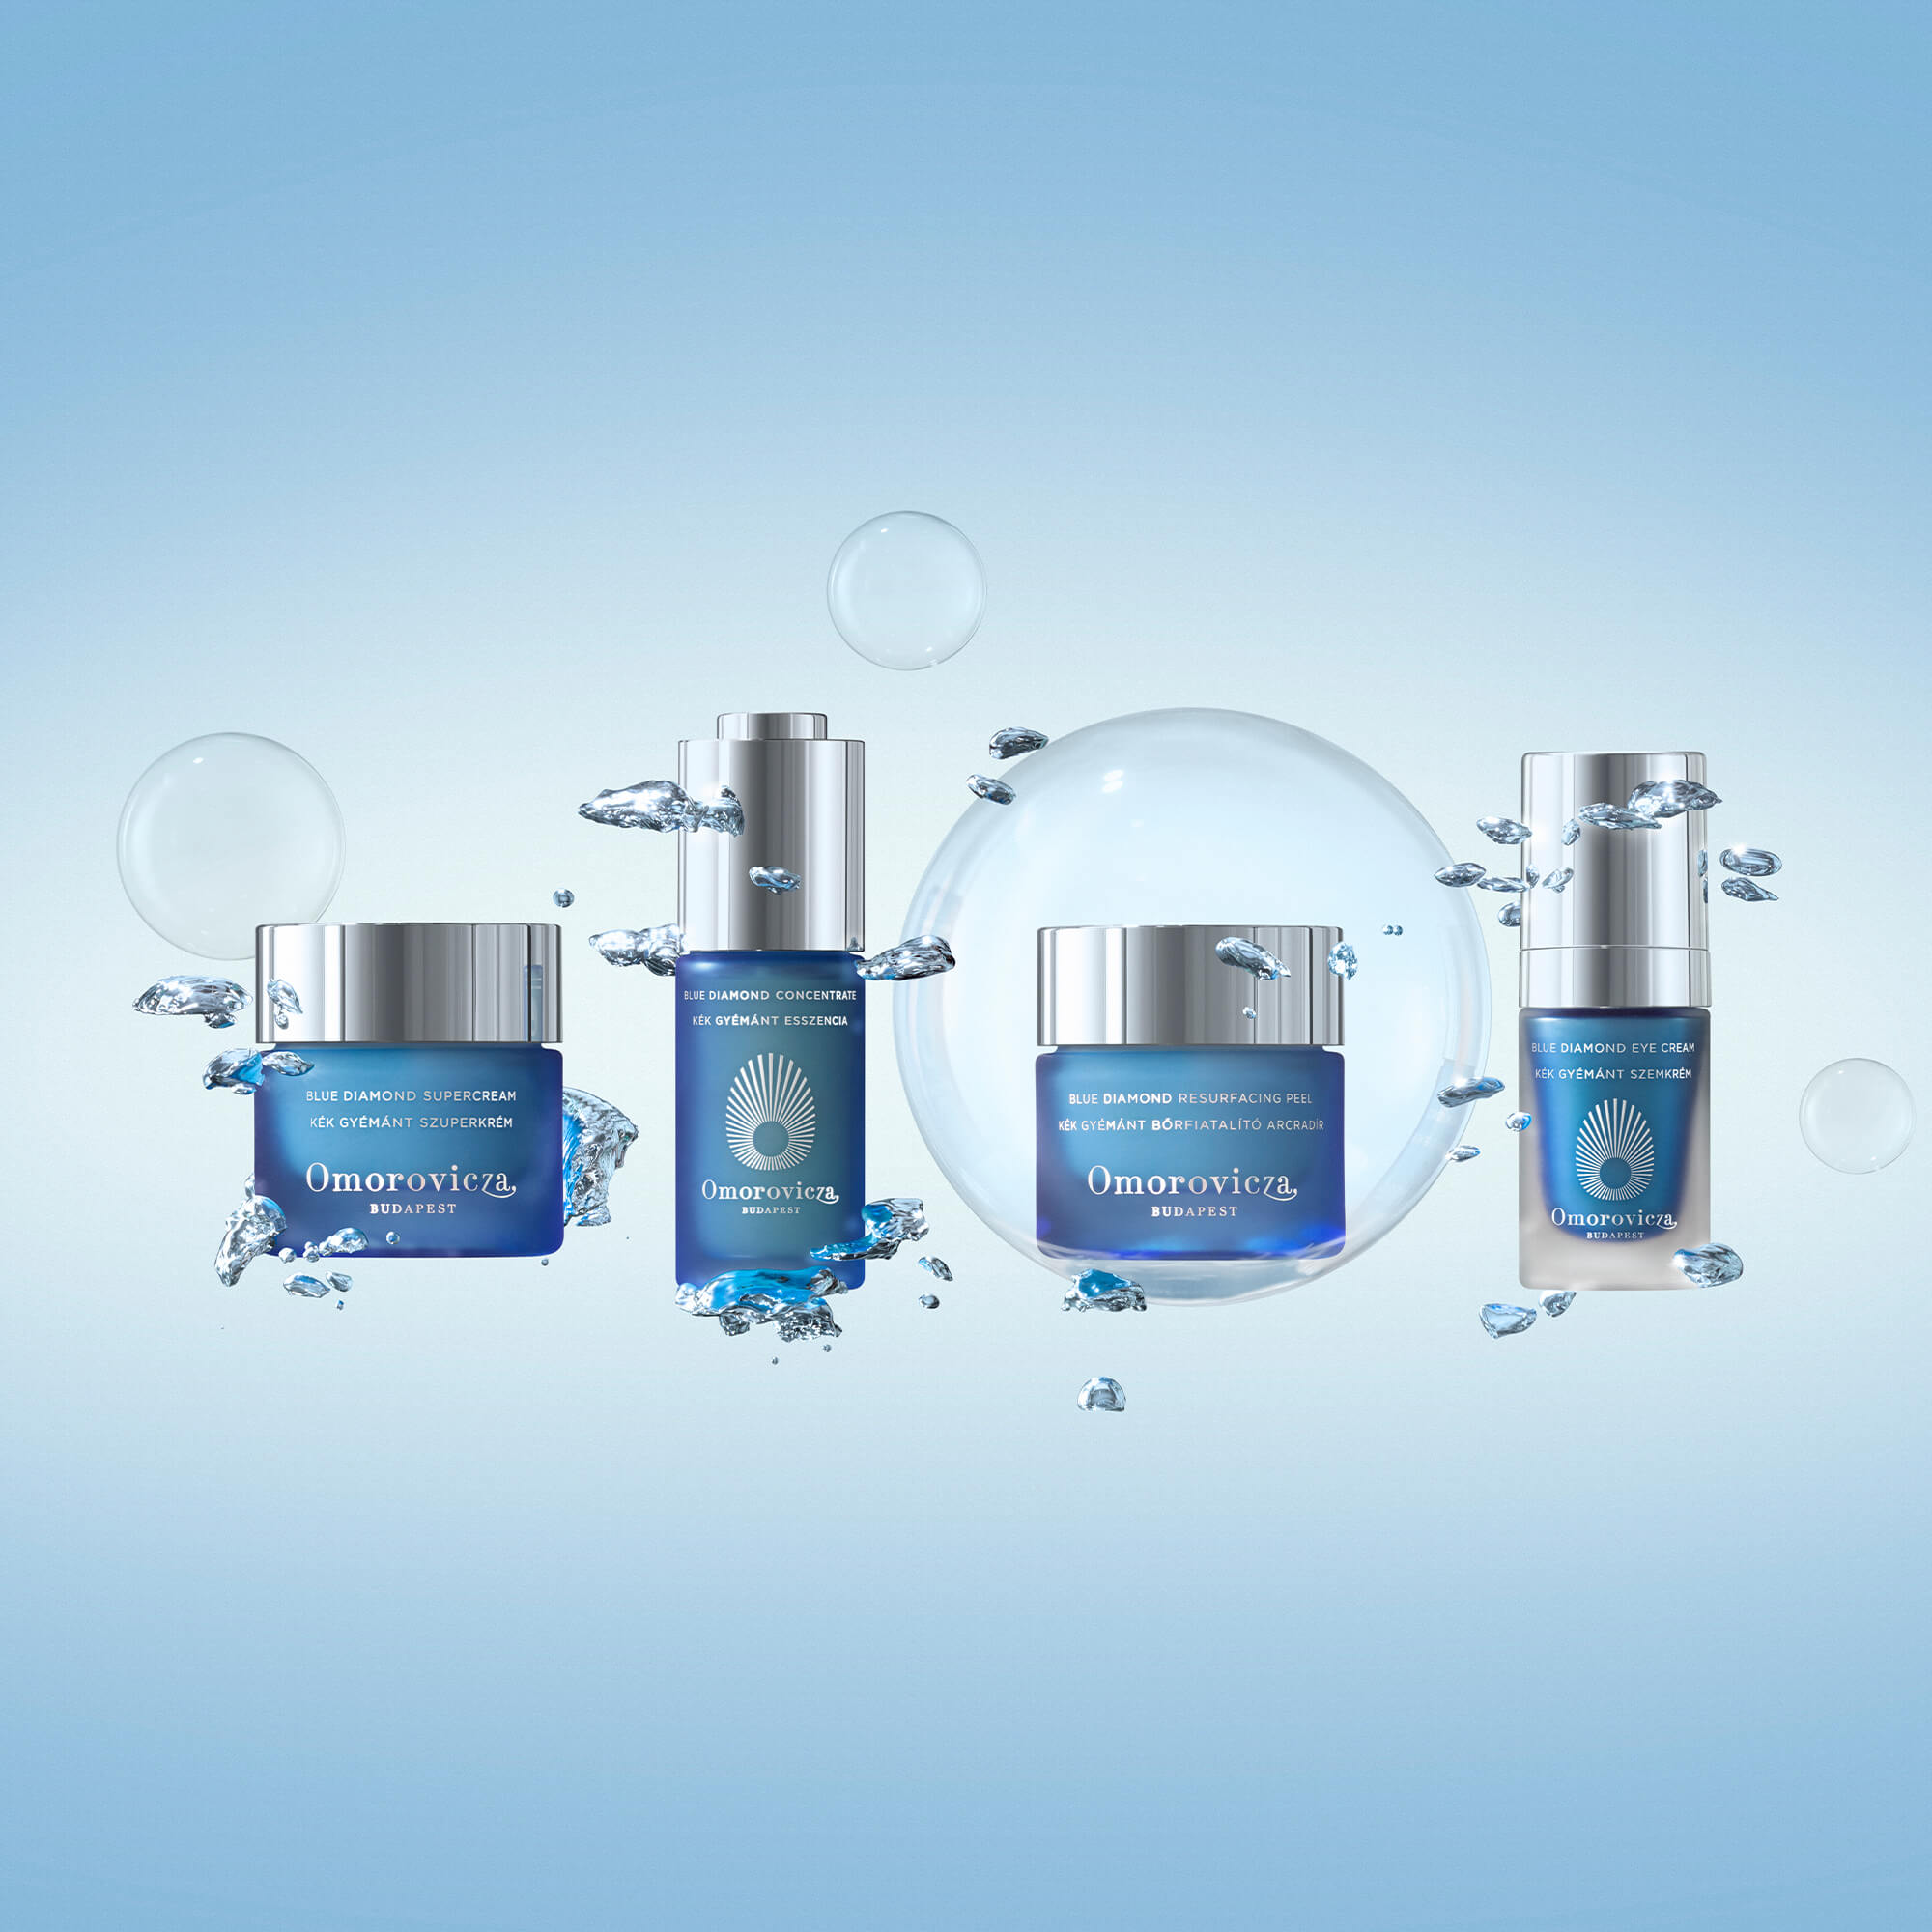 Omorovicza Blue Diamond Collection